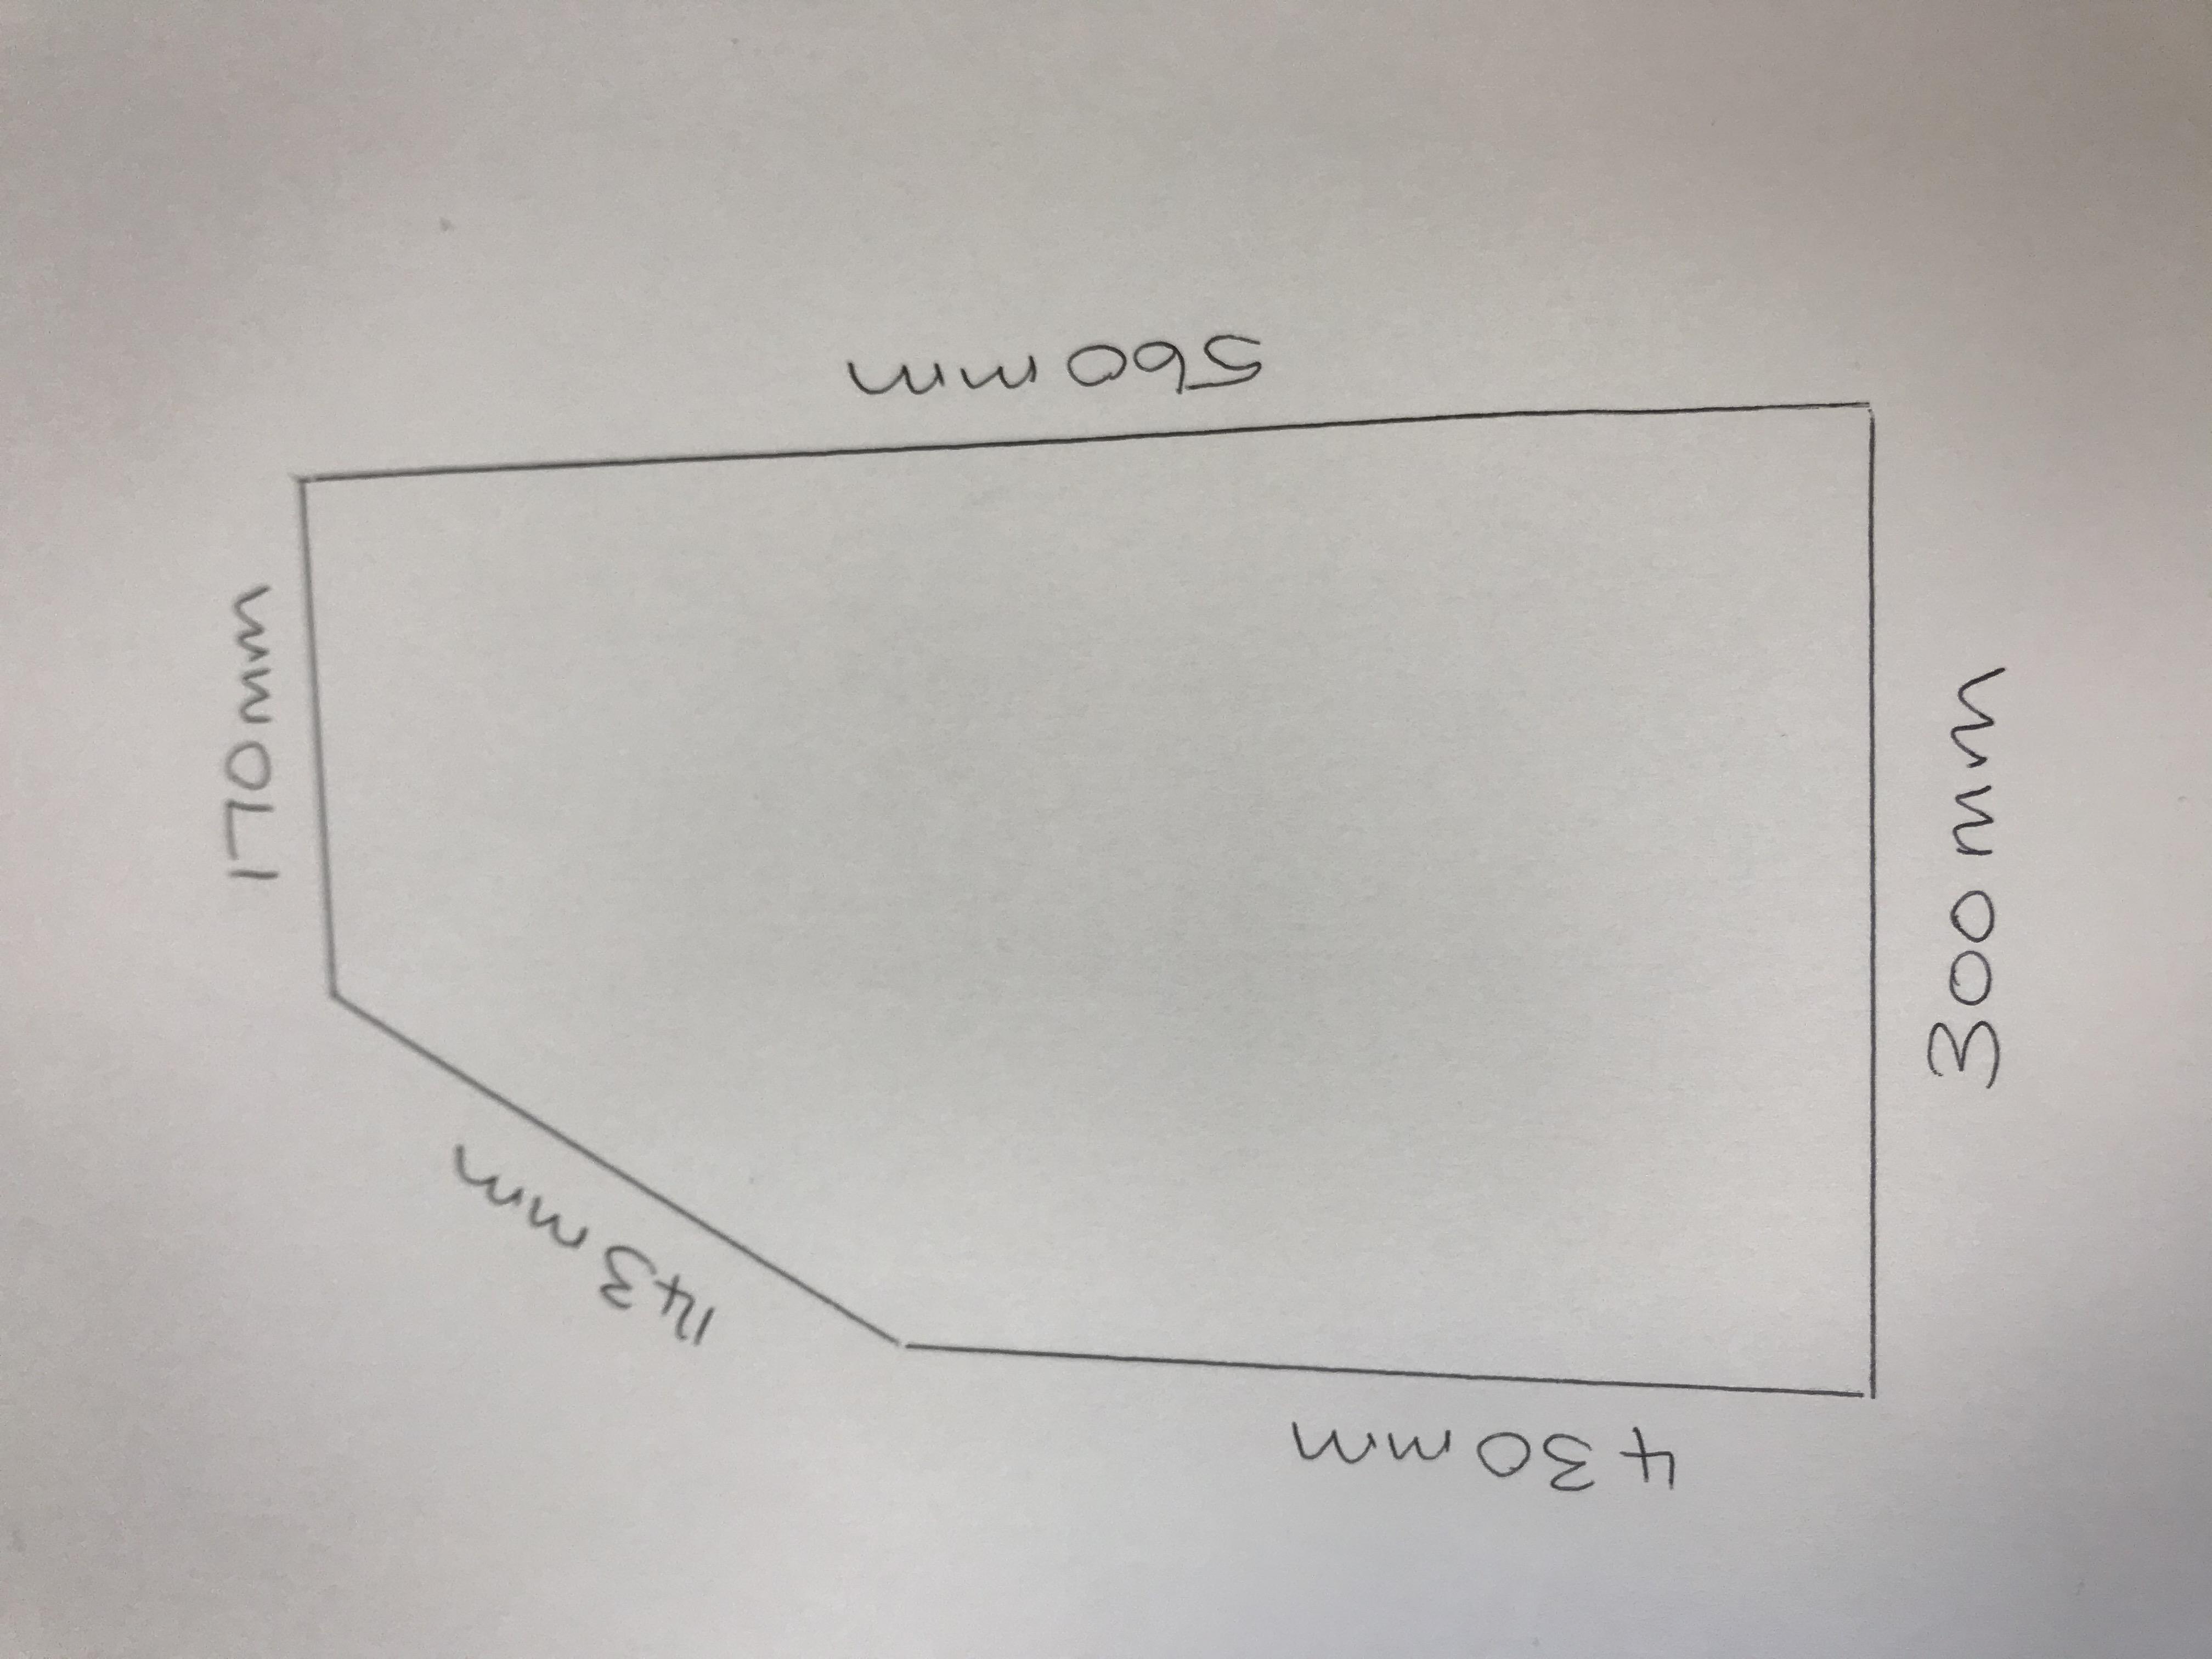 300mm Base End Quadrant Dimensions